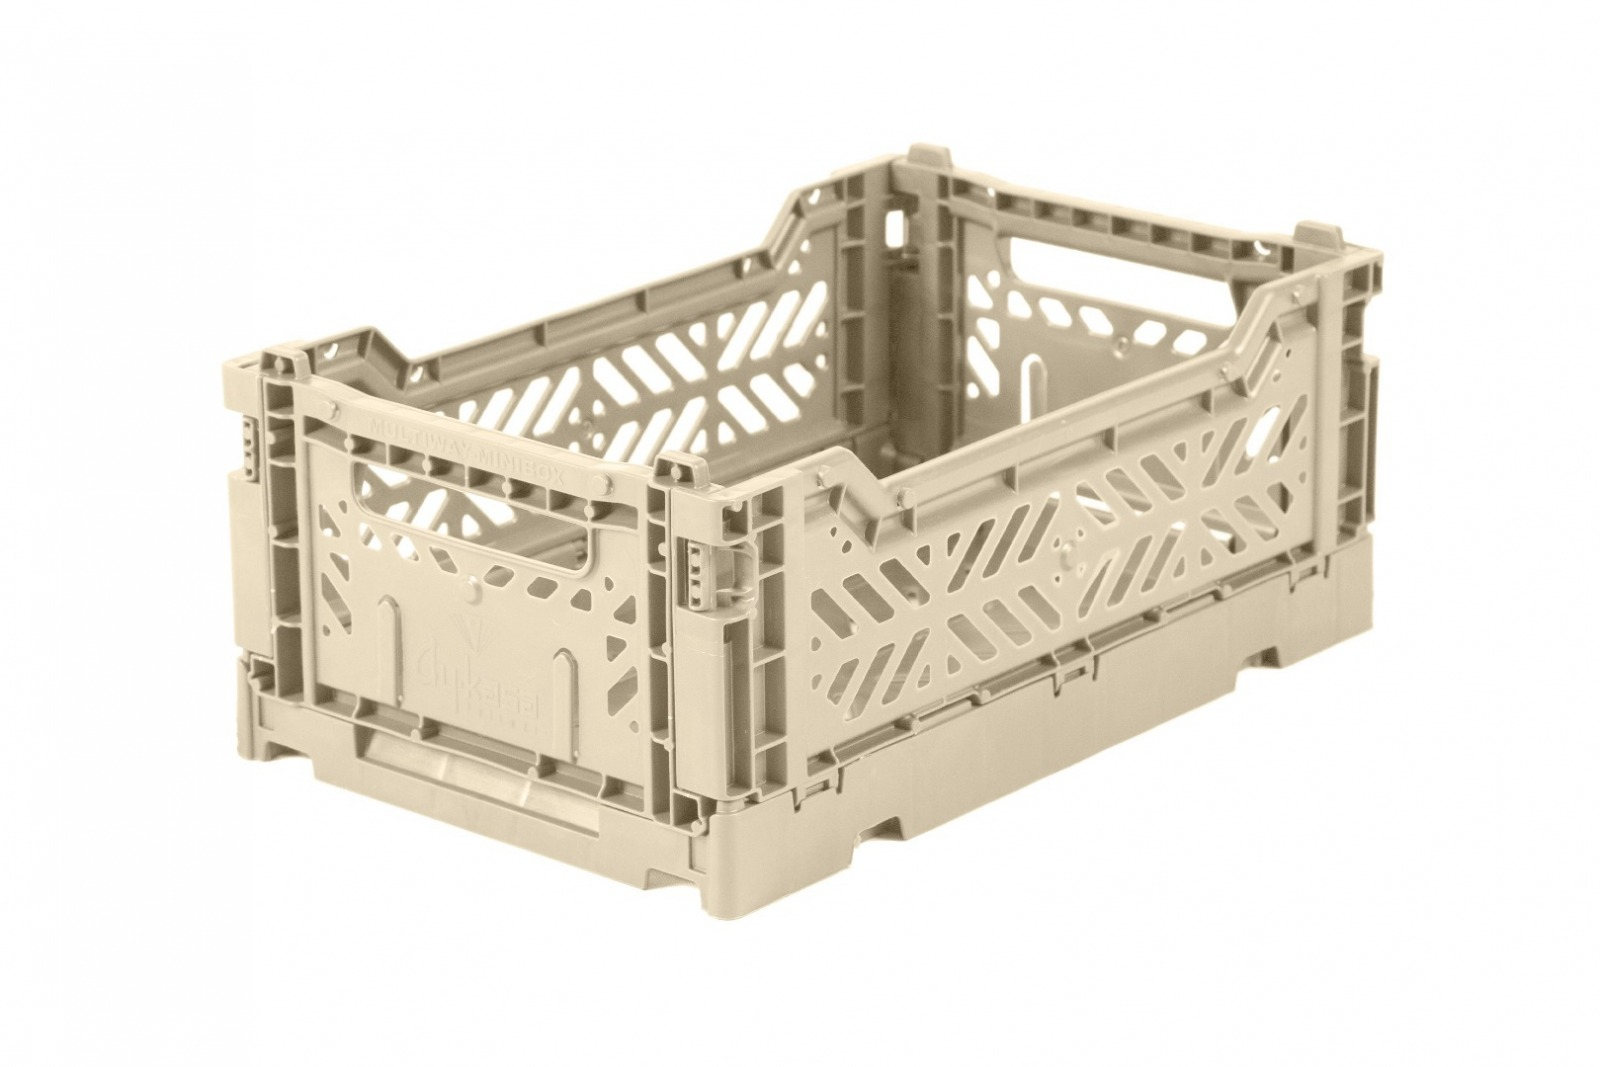 AyKasa Mini Storage Box - Boulder